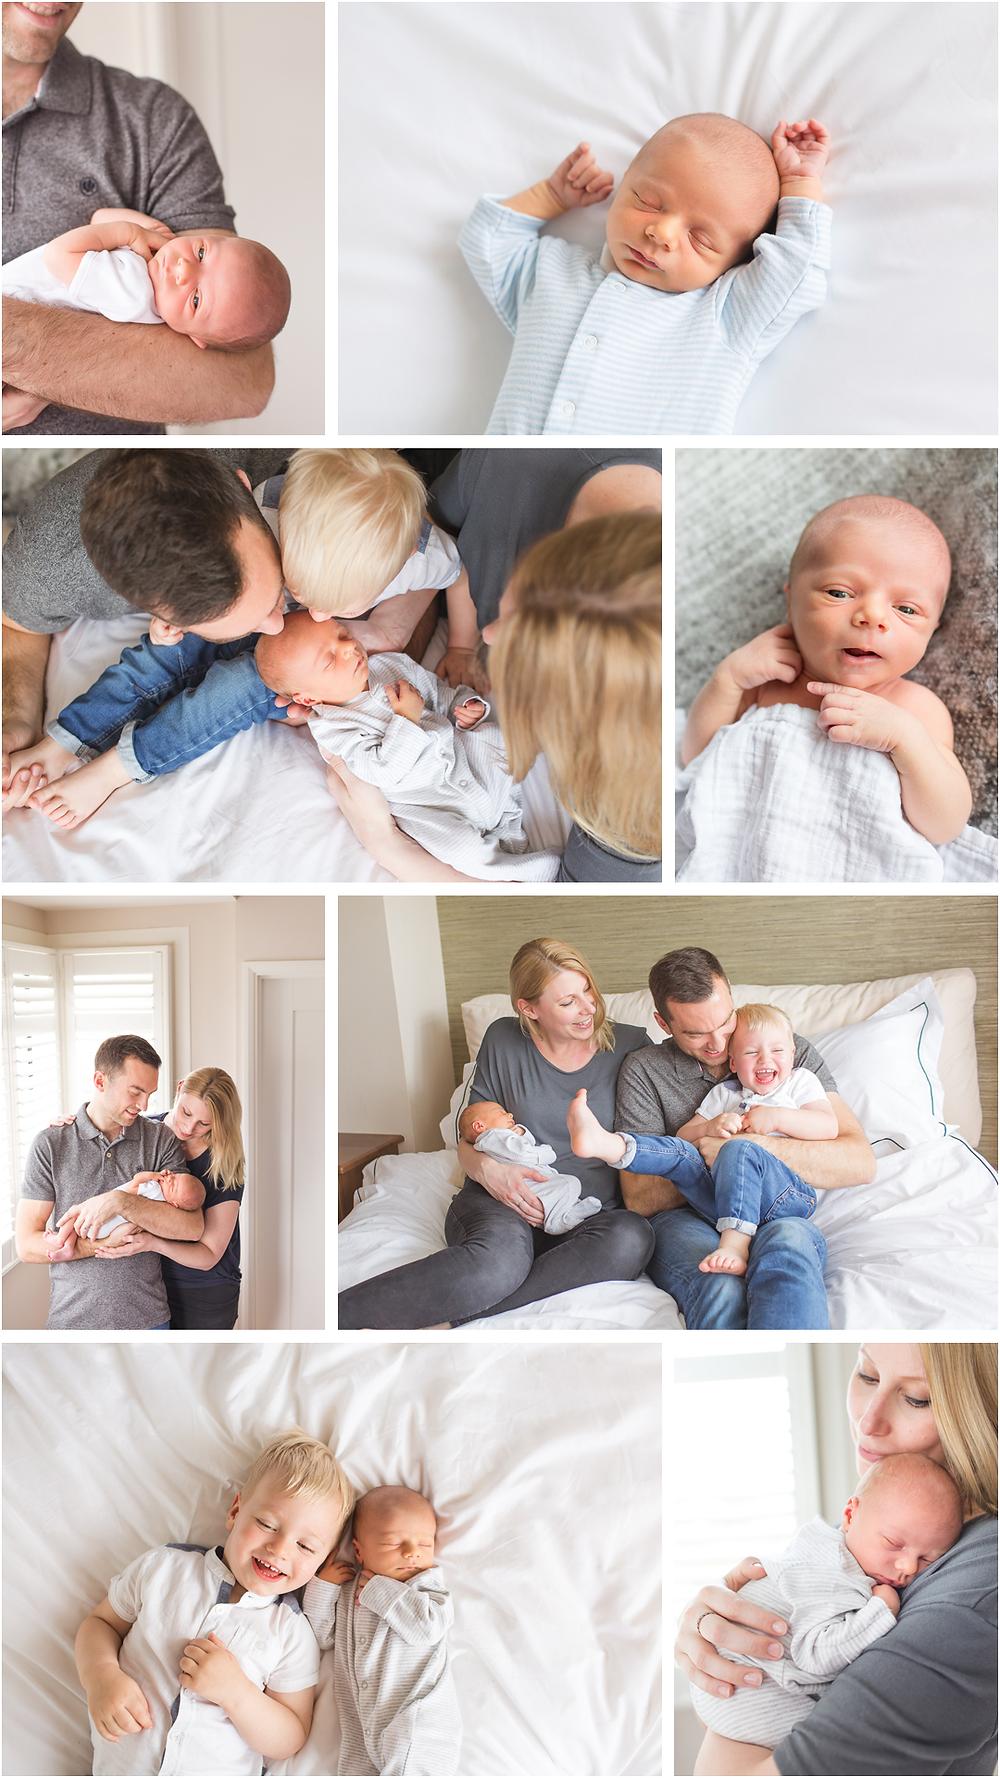 In-home newborn photography session | Addlestone & Weybridge Newborn & Family Photographer